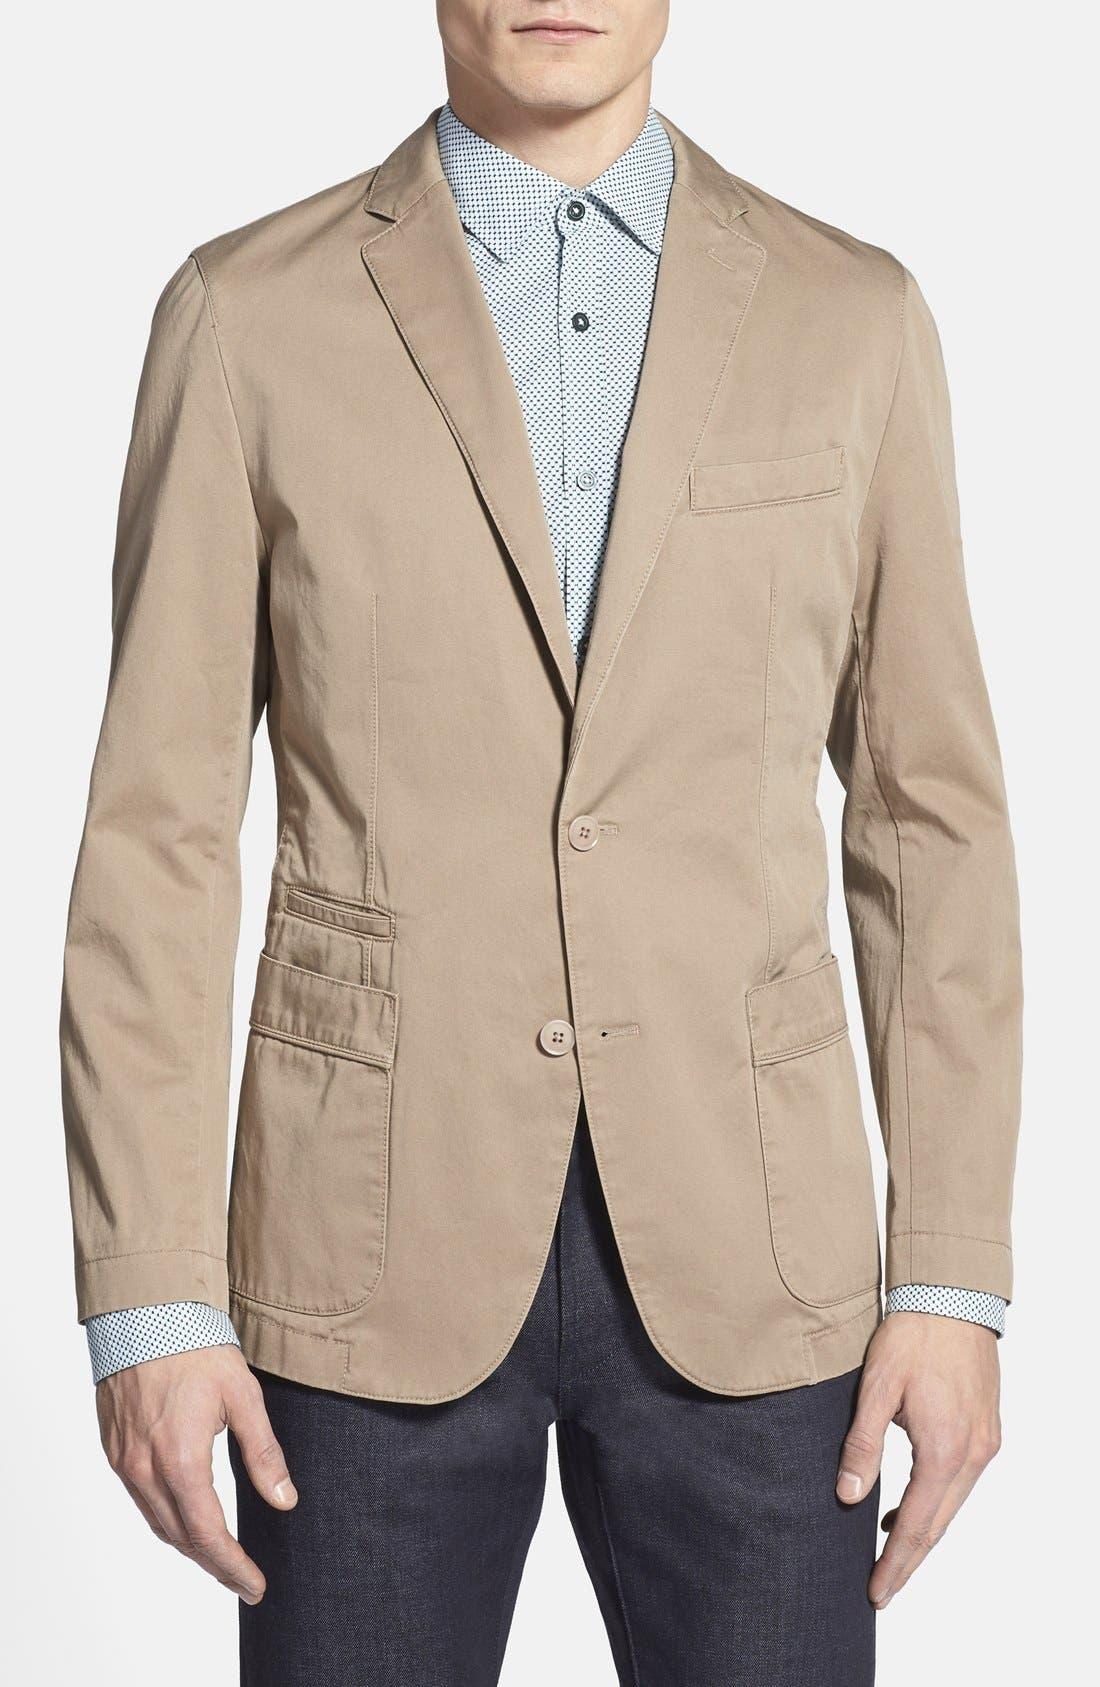 BOSS 'Menvin' Trim Fit Cotton Twill Sport Coat, Main, color, 262